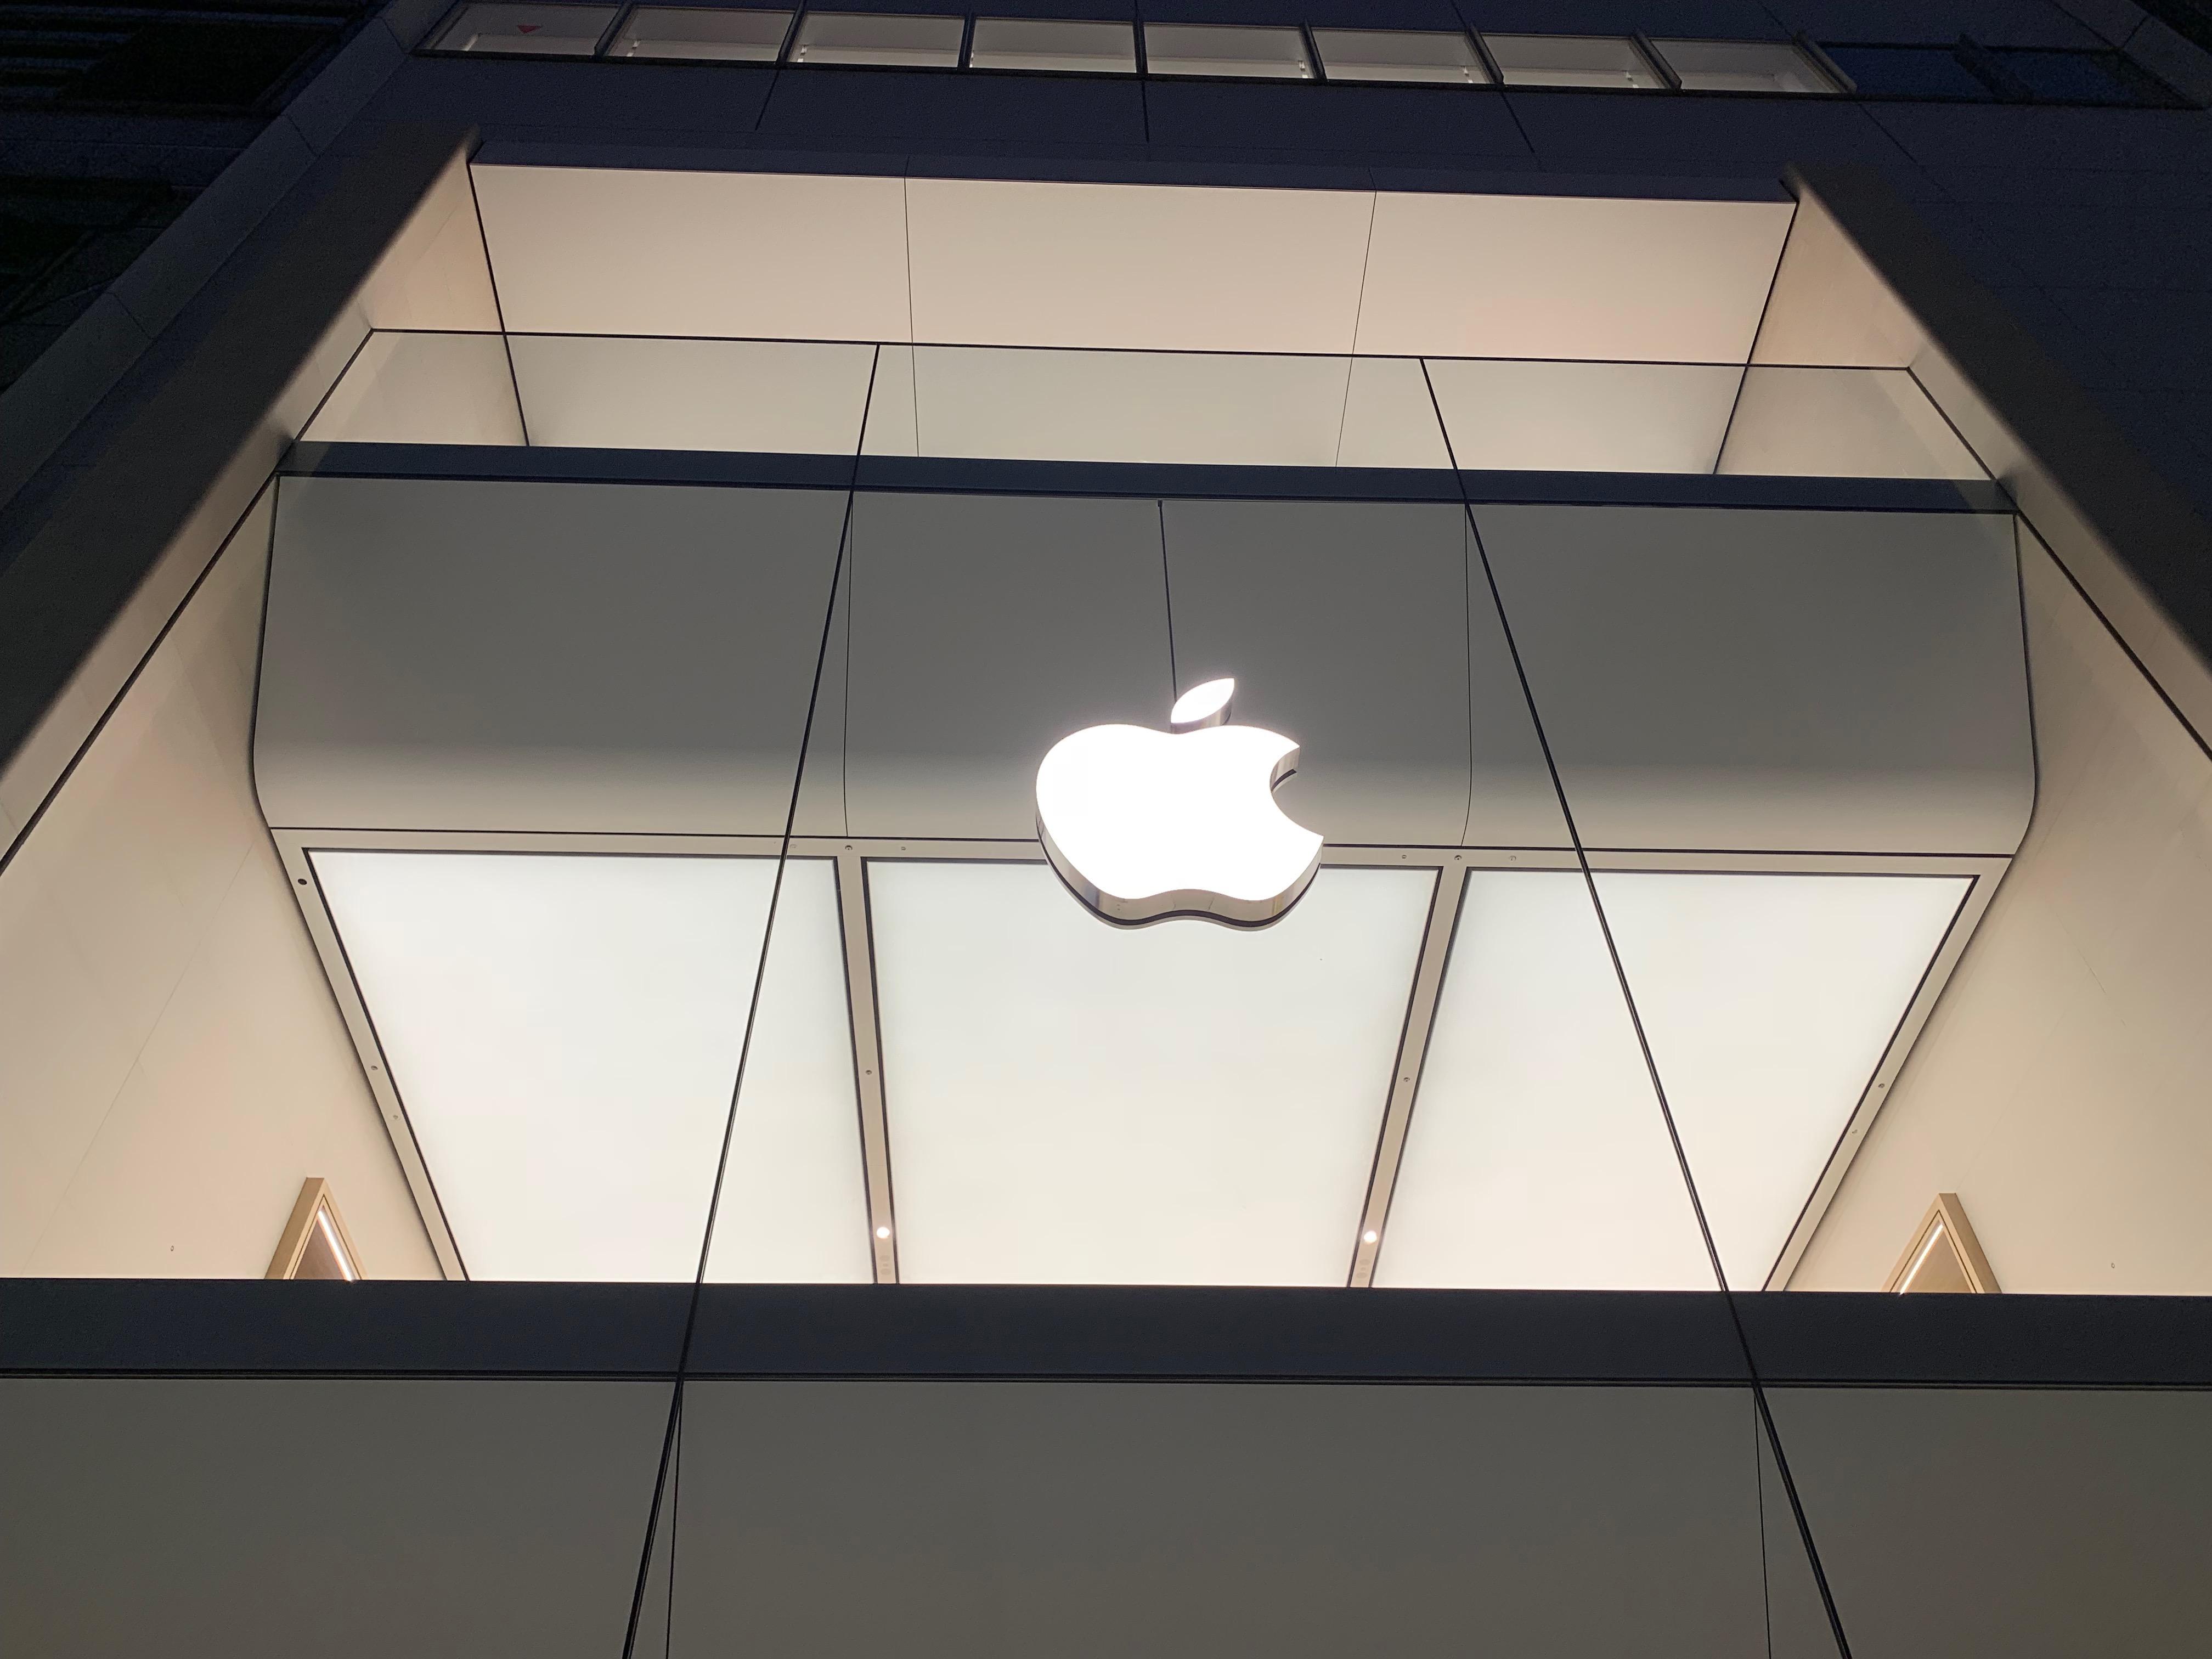 「Apple 渋谷」リニューアルオープンをレポート